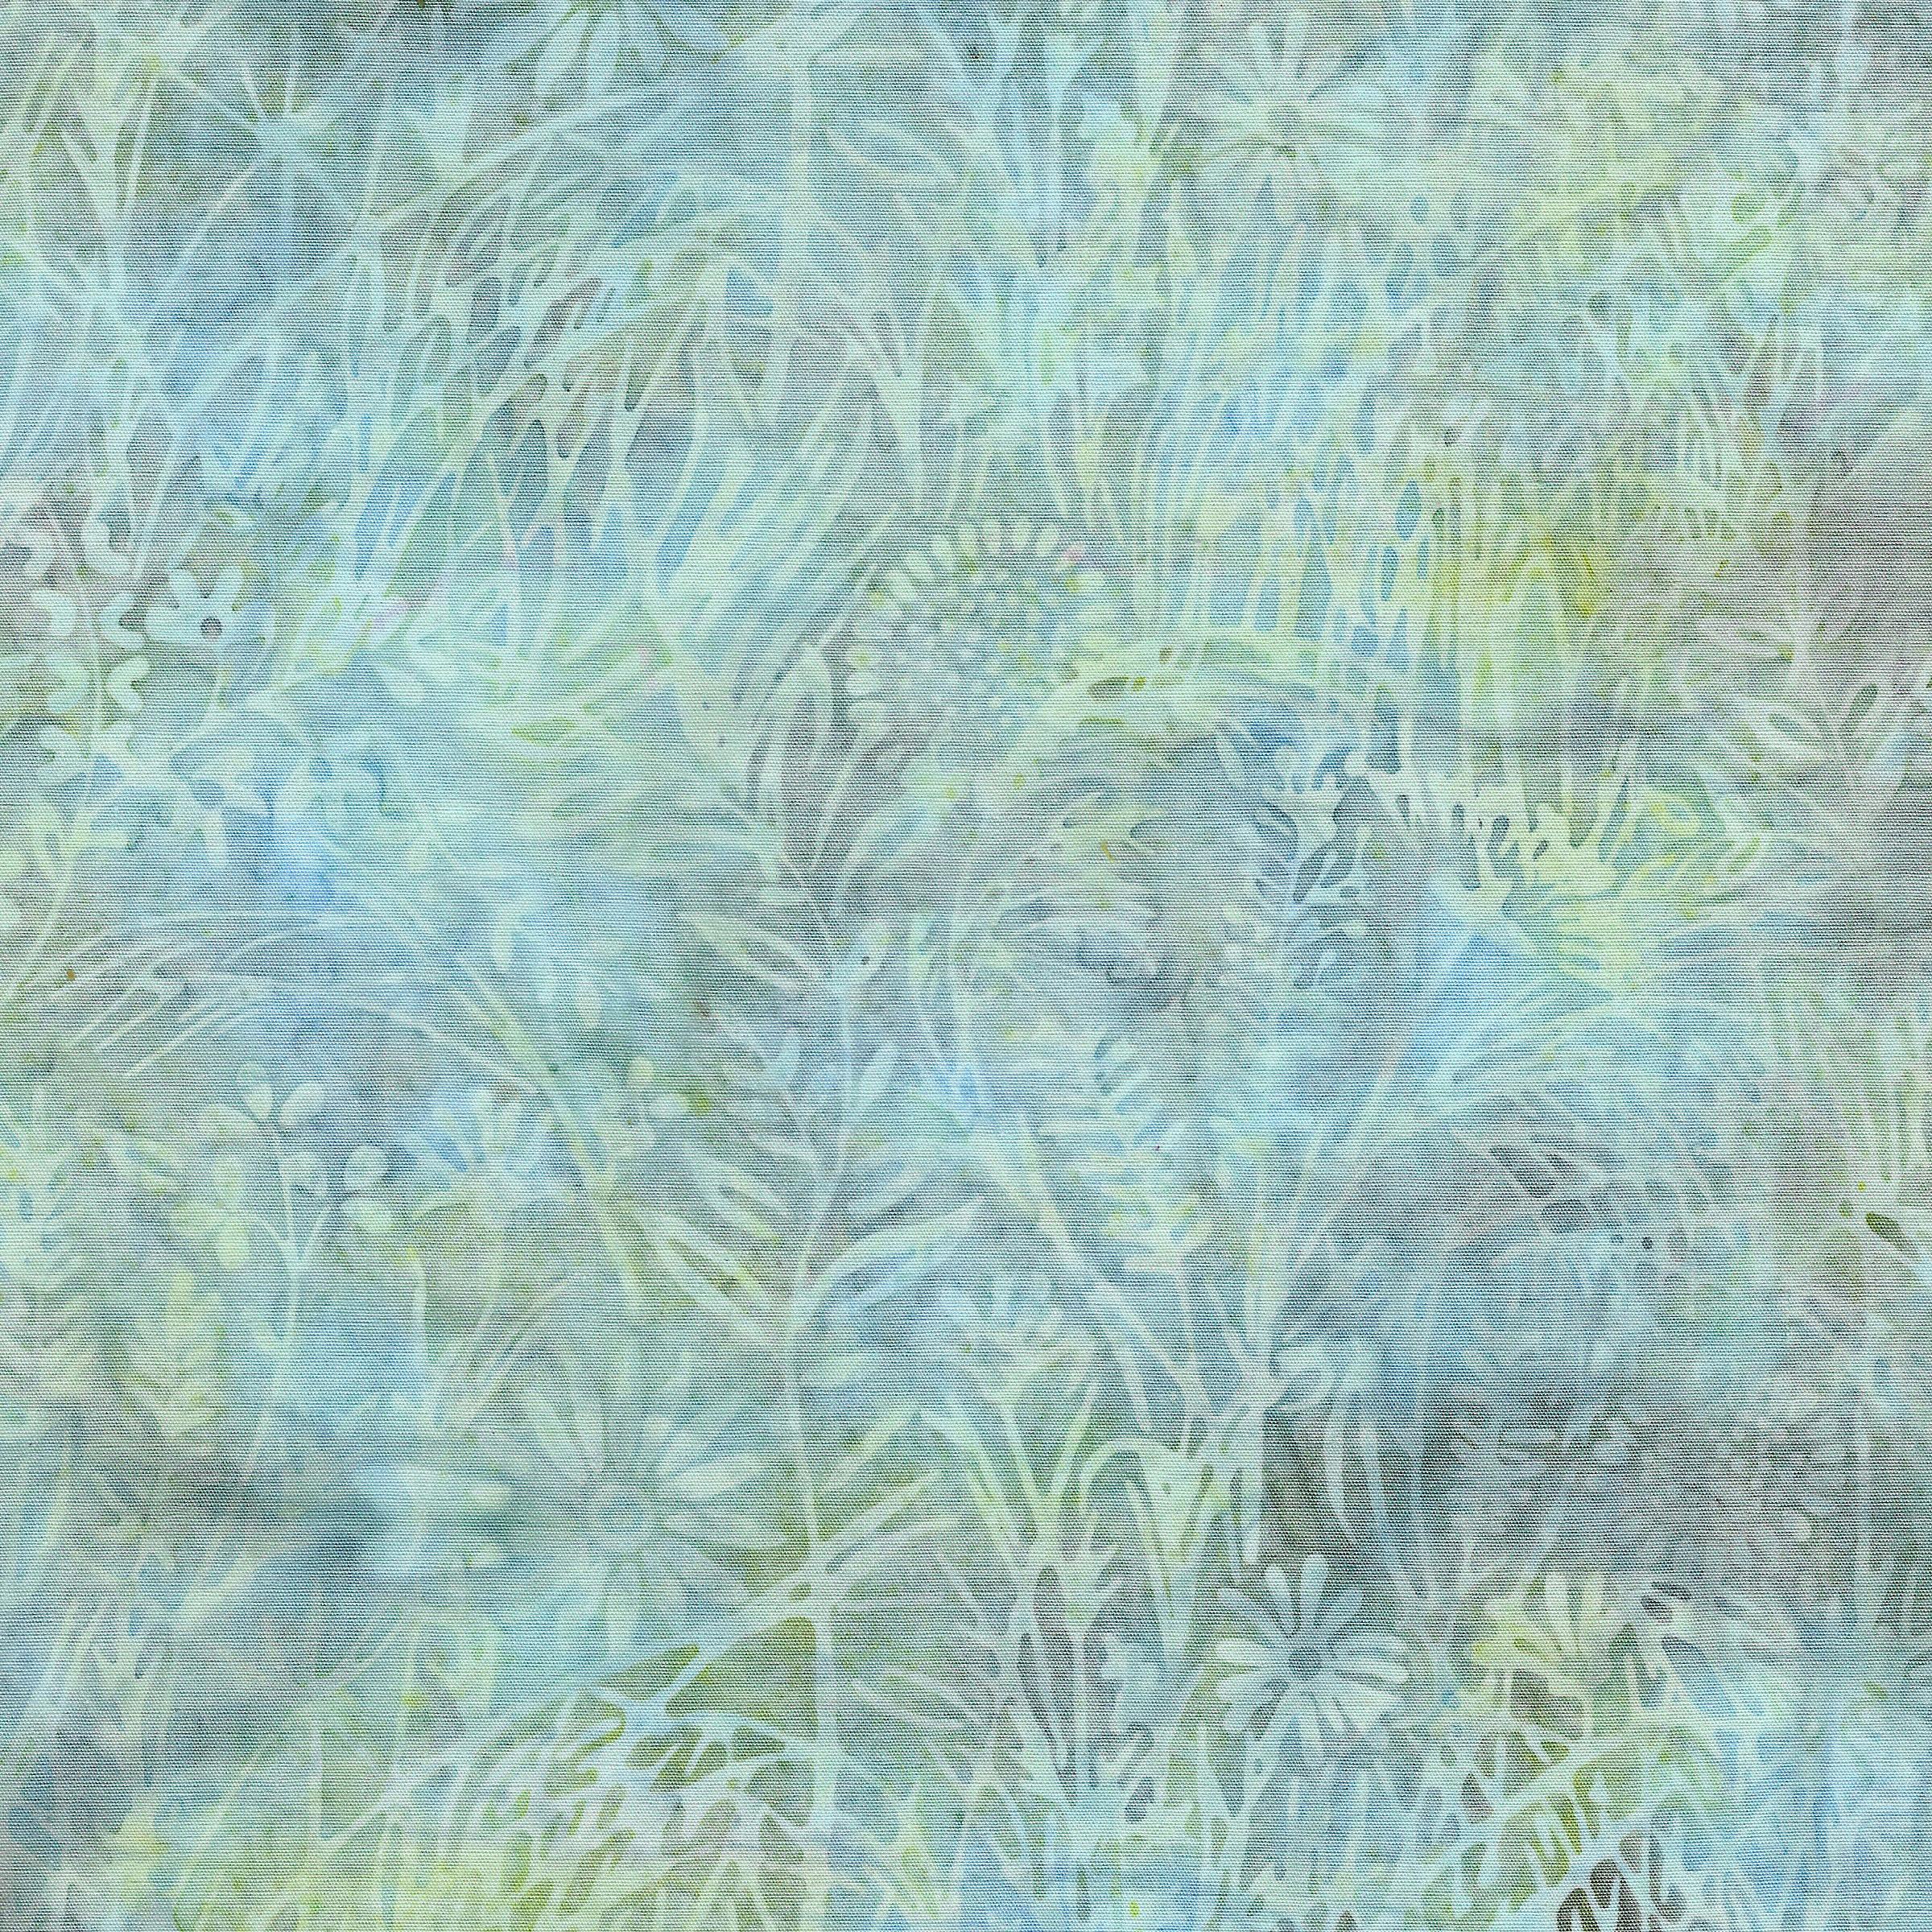 111931501 / WIldflowers  -Icicle